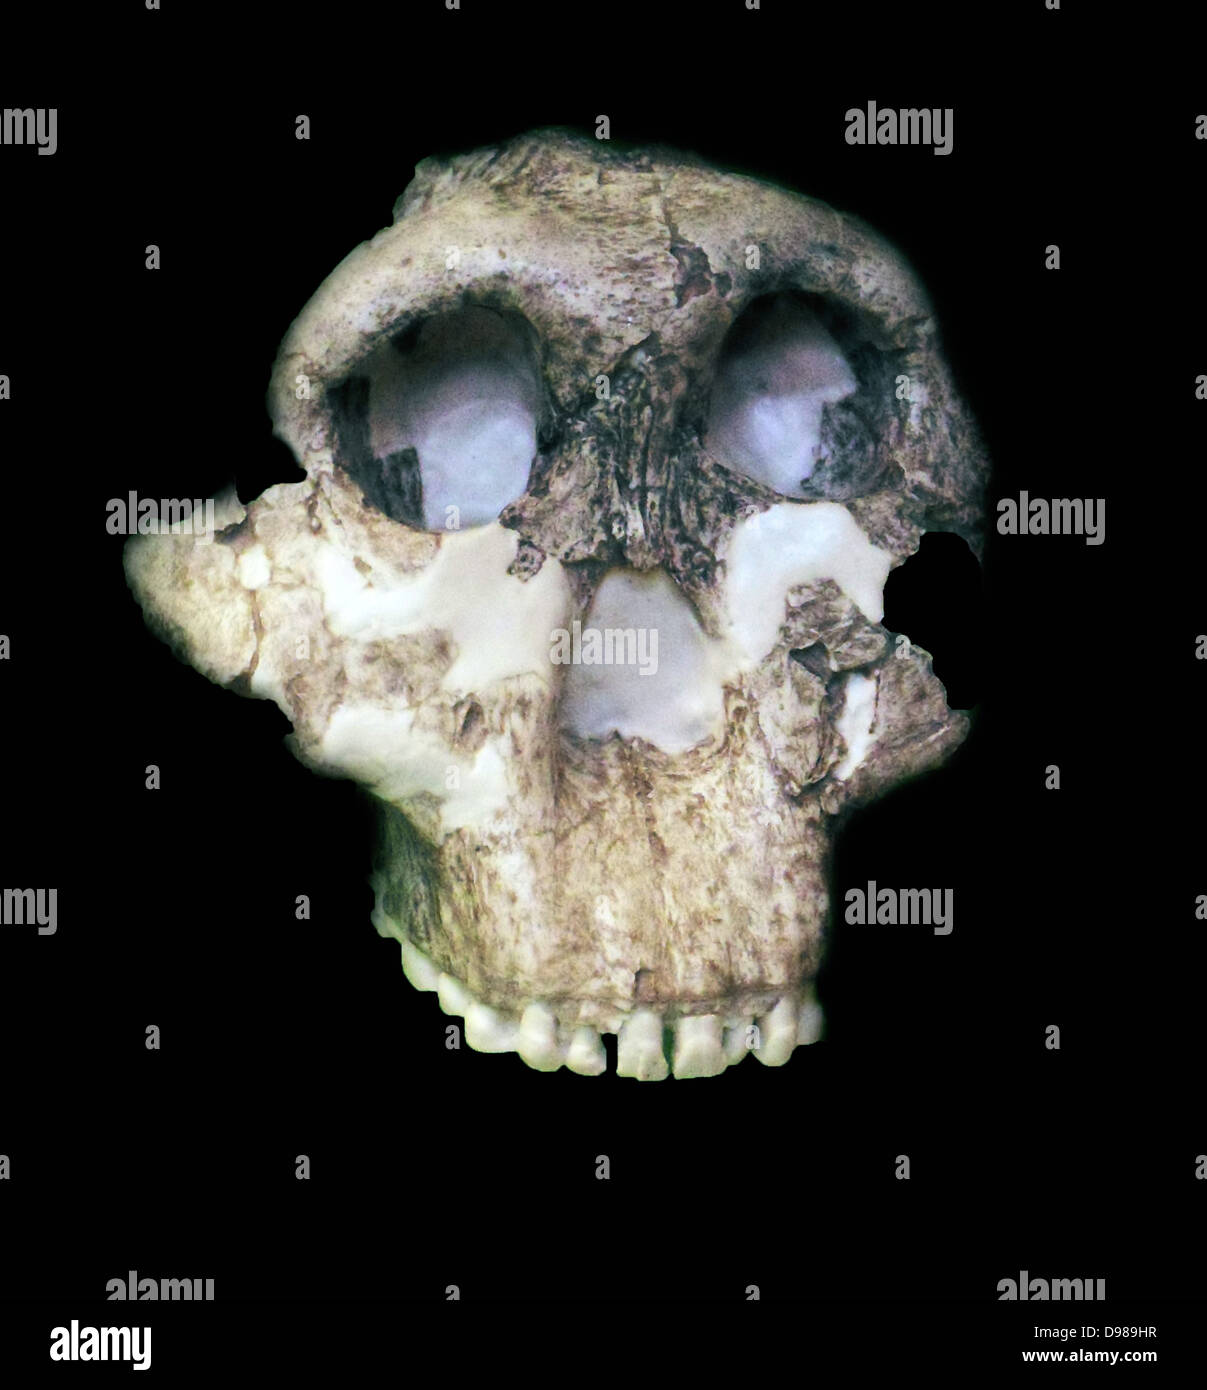 Paranthropus boisei (originally called Zinjanthropus boisei and then Australopithecus boisei until recently) was - Stock Image